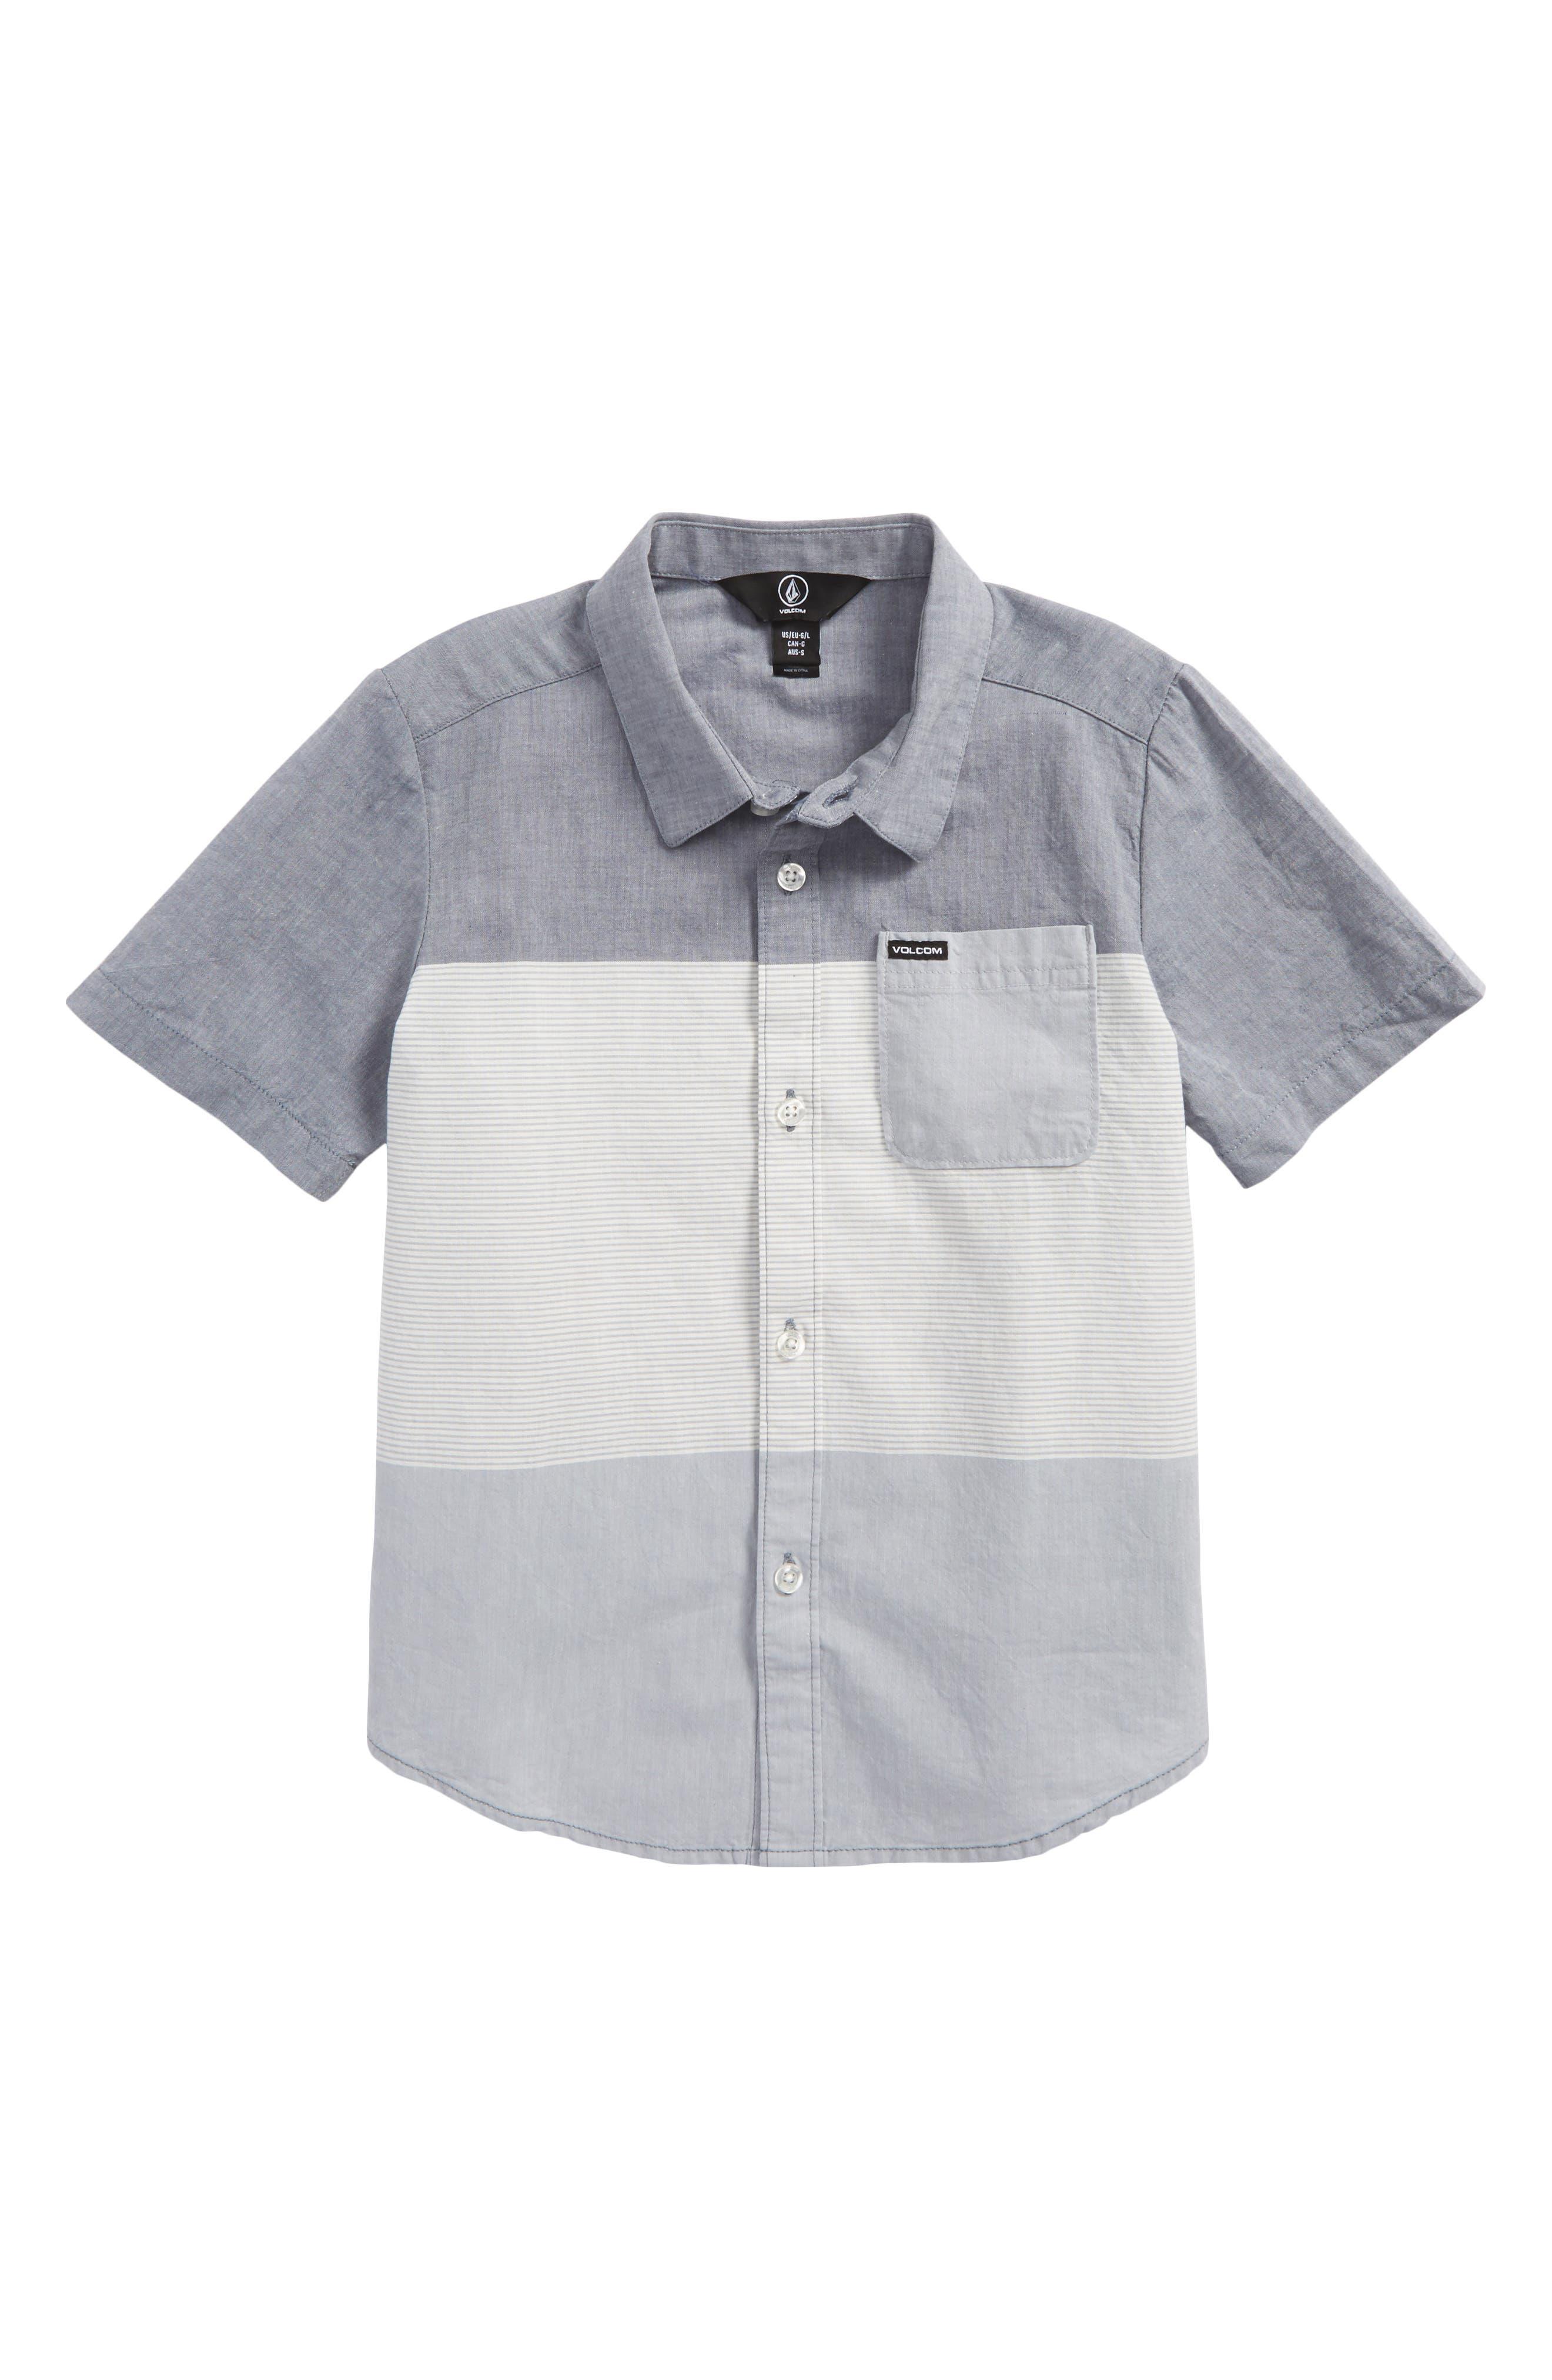 Volcom Crestone Woven Shirt (Big Boys)